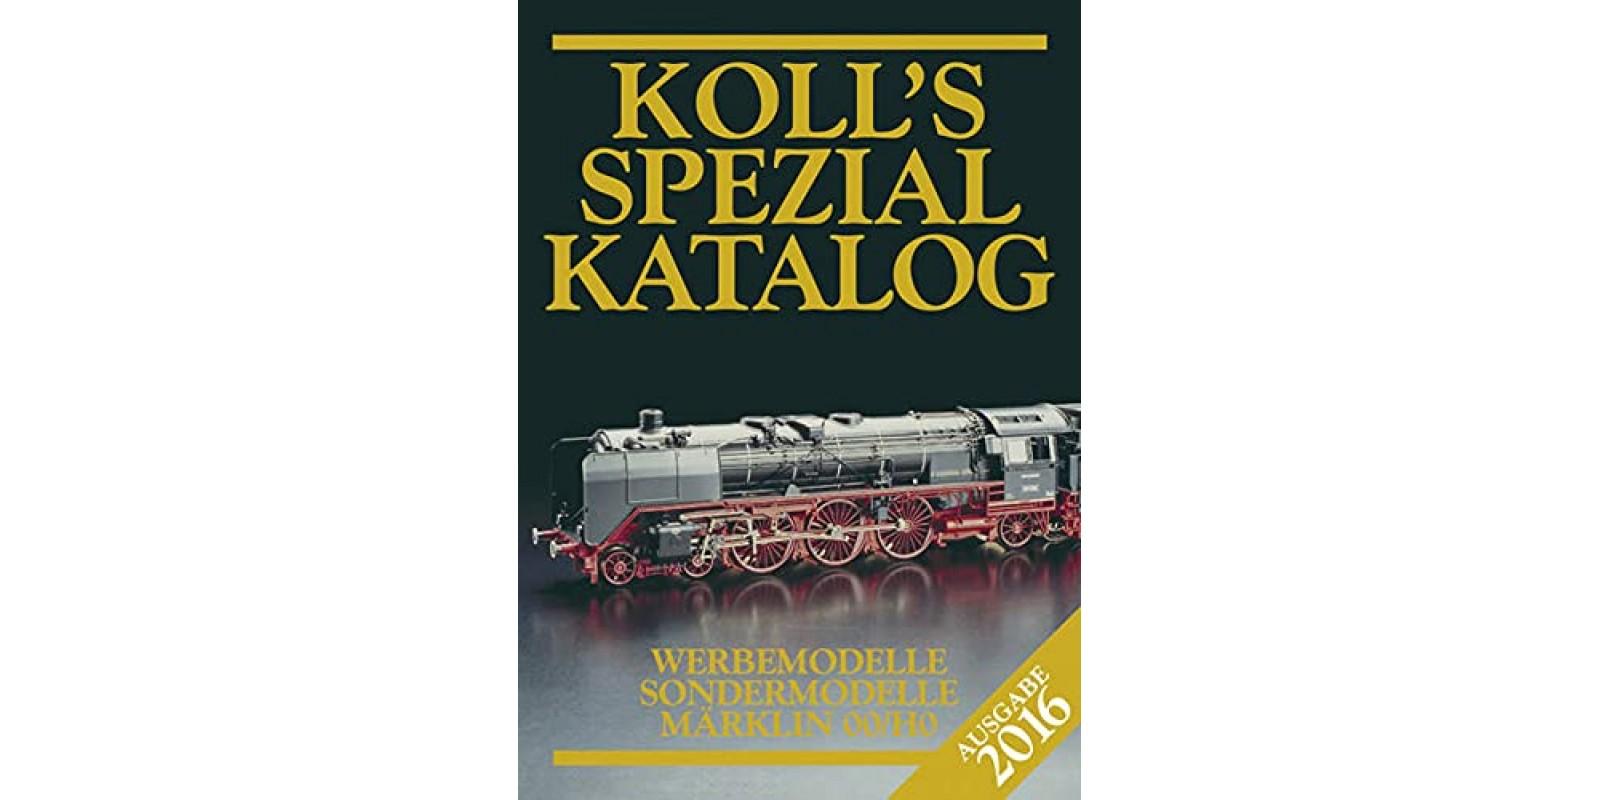 KOKASP2016 Koll's Preiskatalog Band 1 ,2016